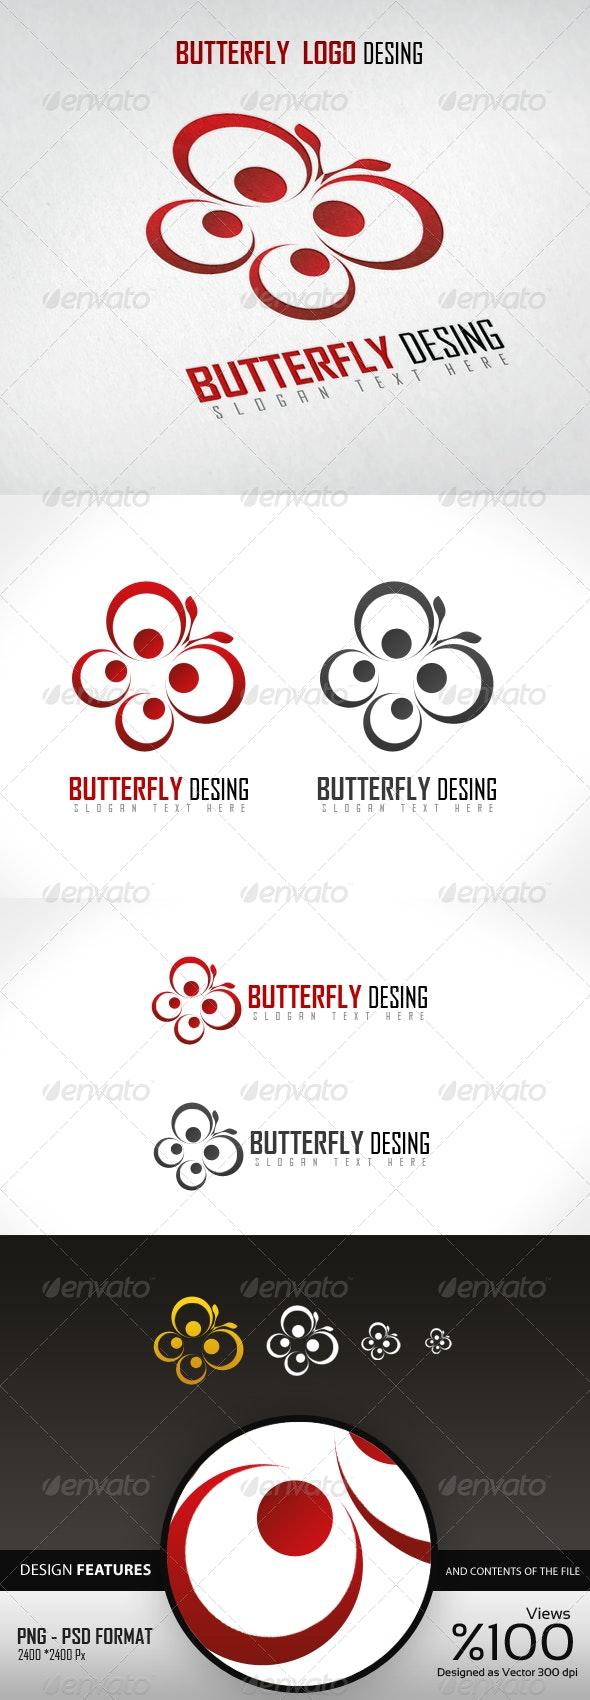 Butterfly Logo Design - Logo Templates